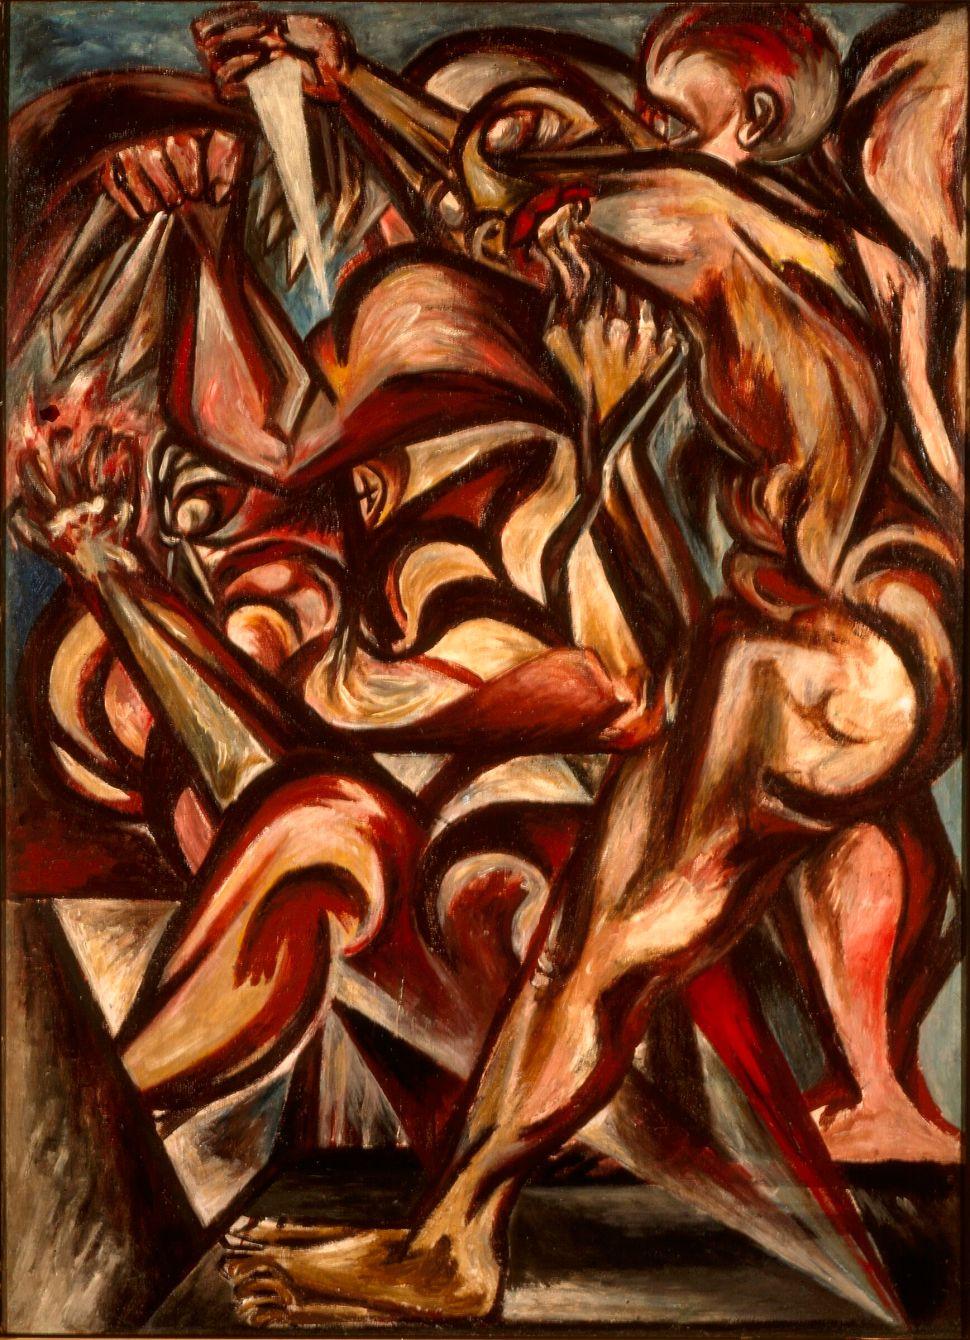 Jackson Pollock, Untitled (Naked Man with Knife), c. 1938–40